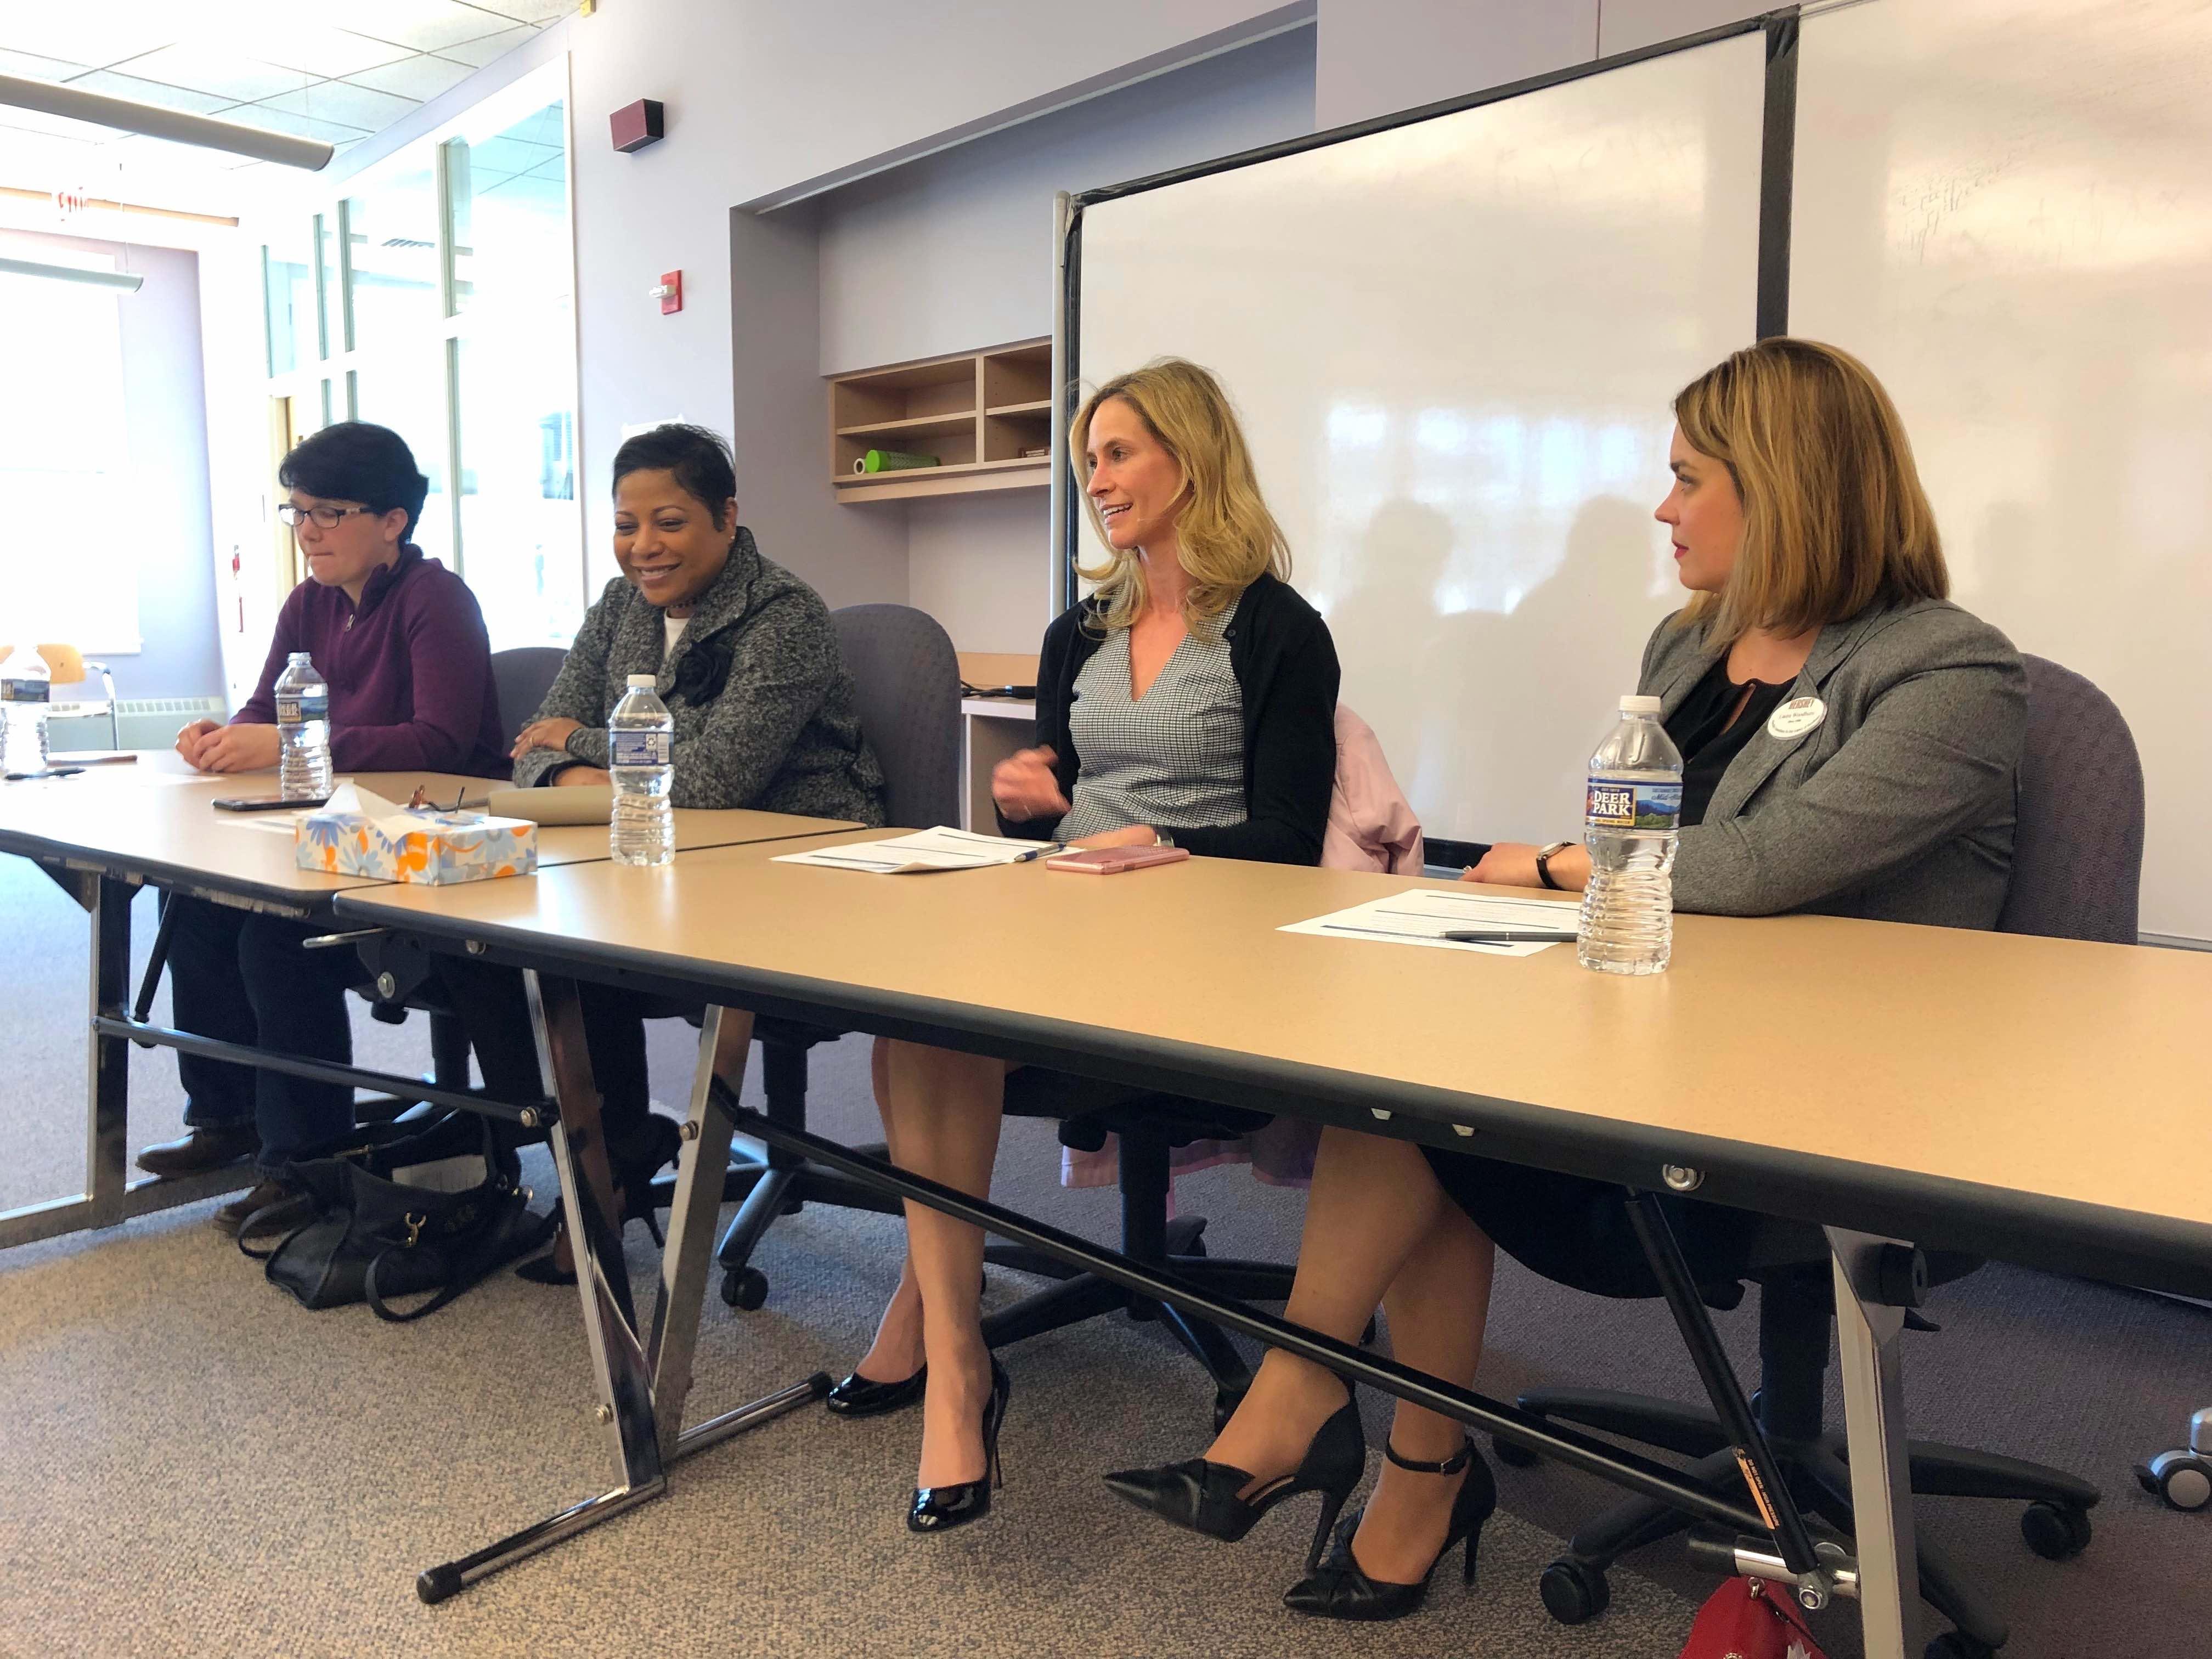 Four female leaders held a leadership workshop for MHS students